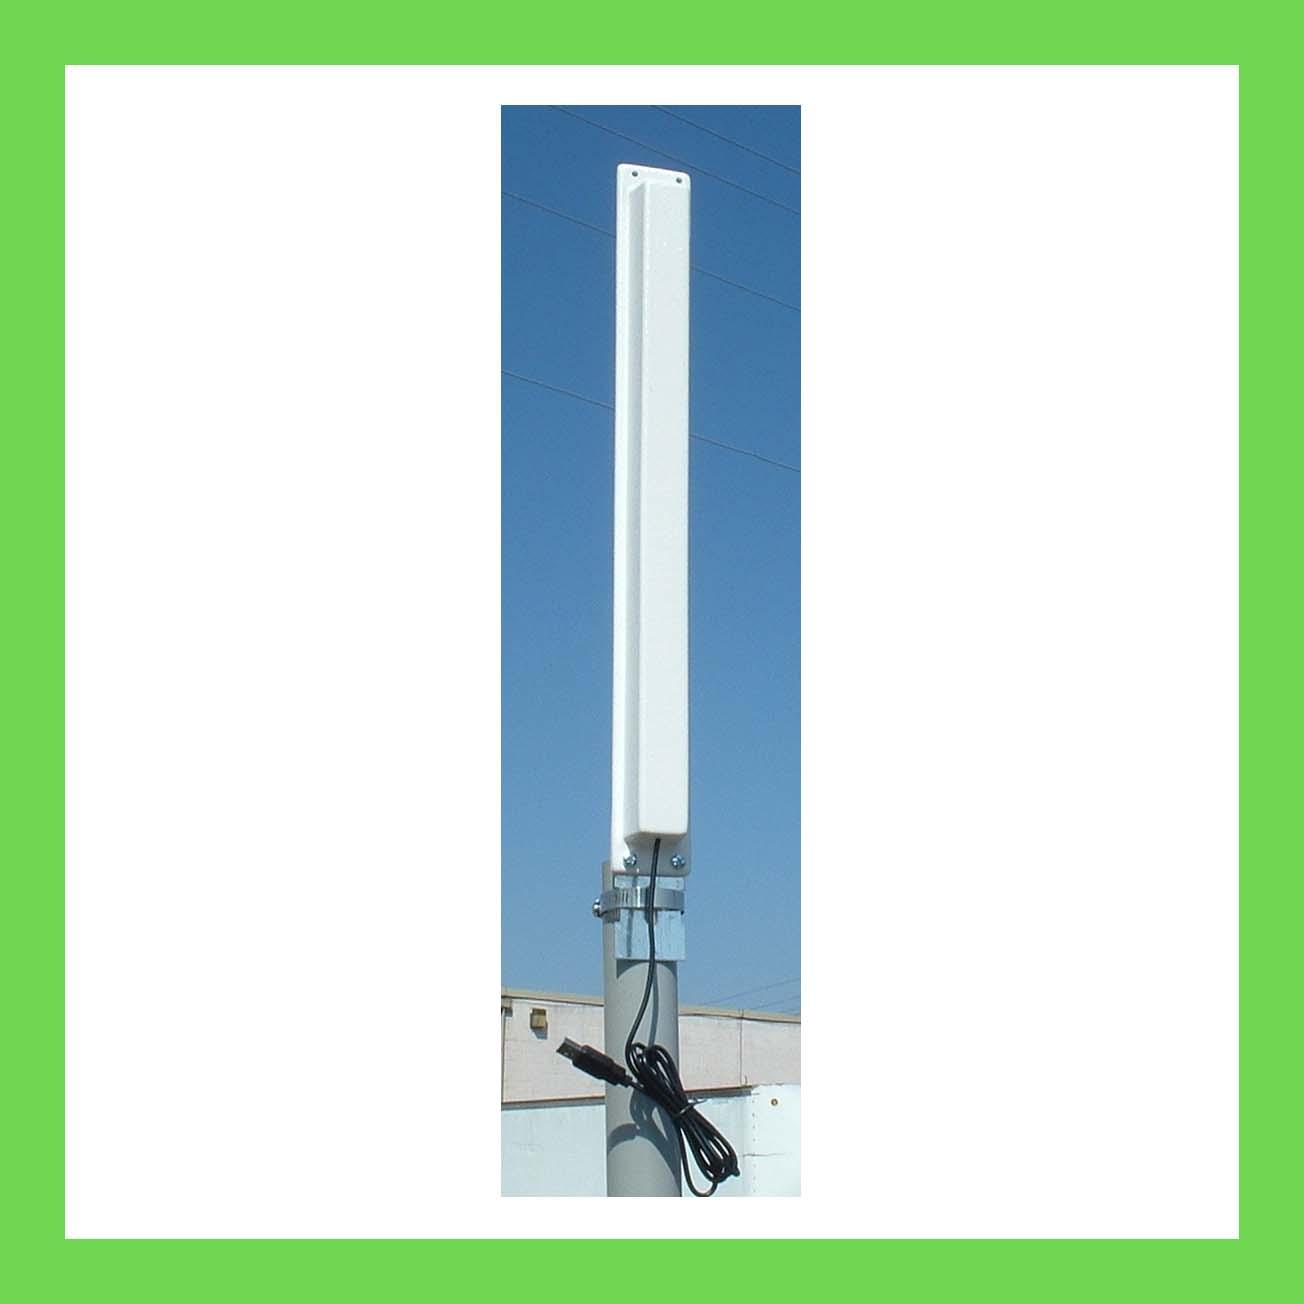 Marine Rv Wifi Omni Usb Antenna Network Booster Adaptor Ebay